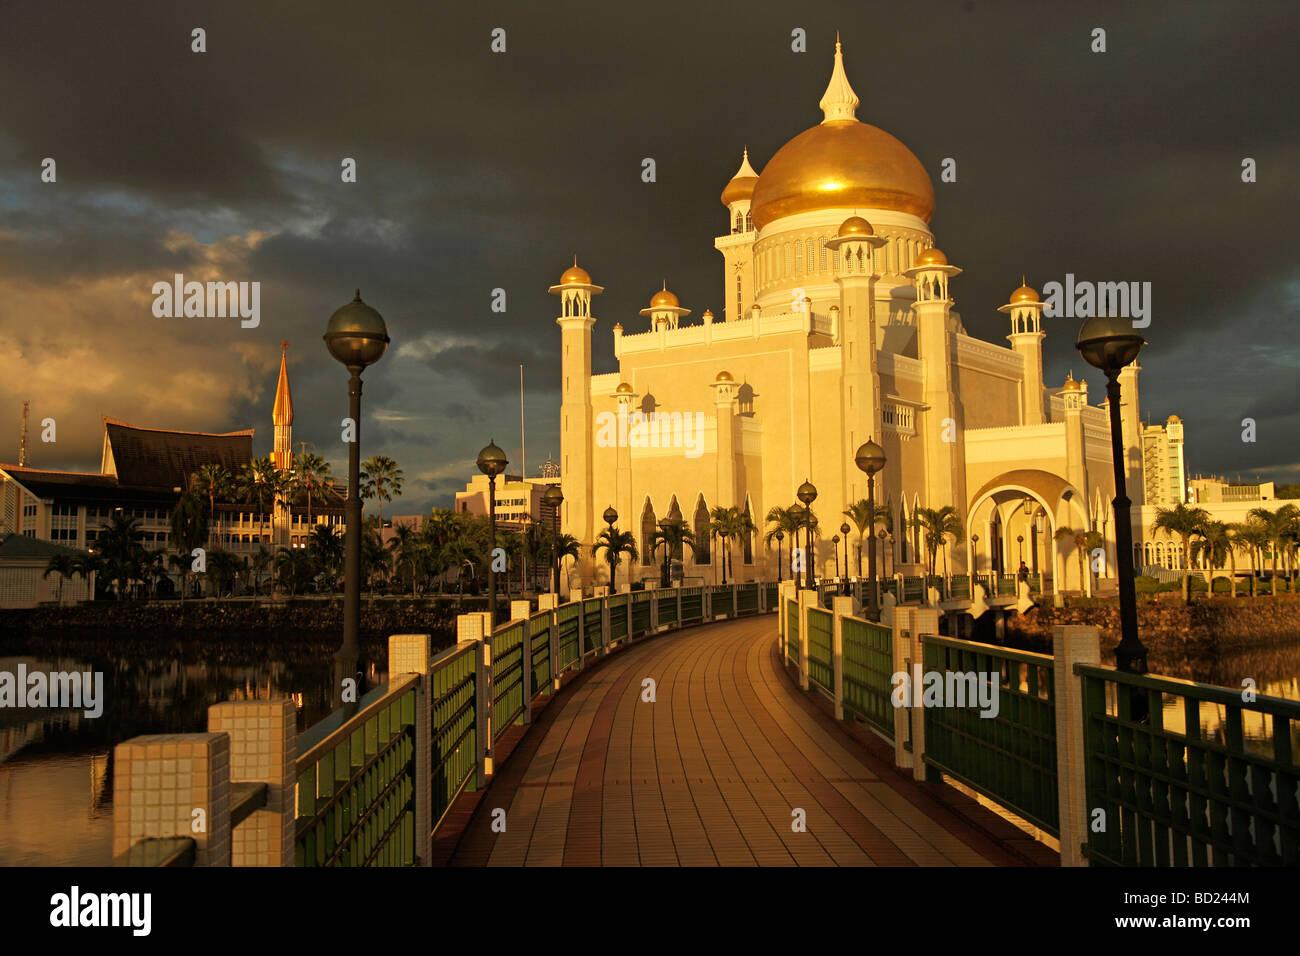 Royal Mosque of Sultan Omar Ali Saifuddin in the capital city Bandar Seri Begawan Brunei Asia - Stock Image